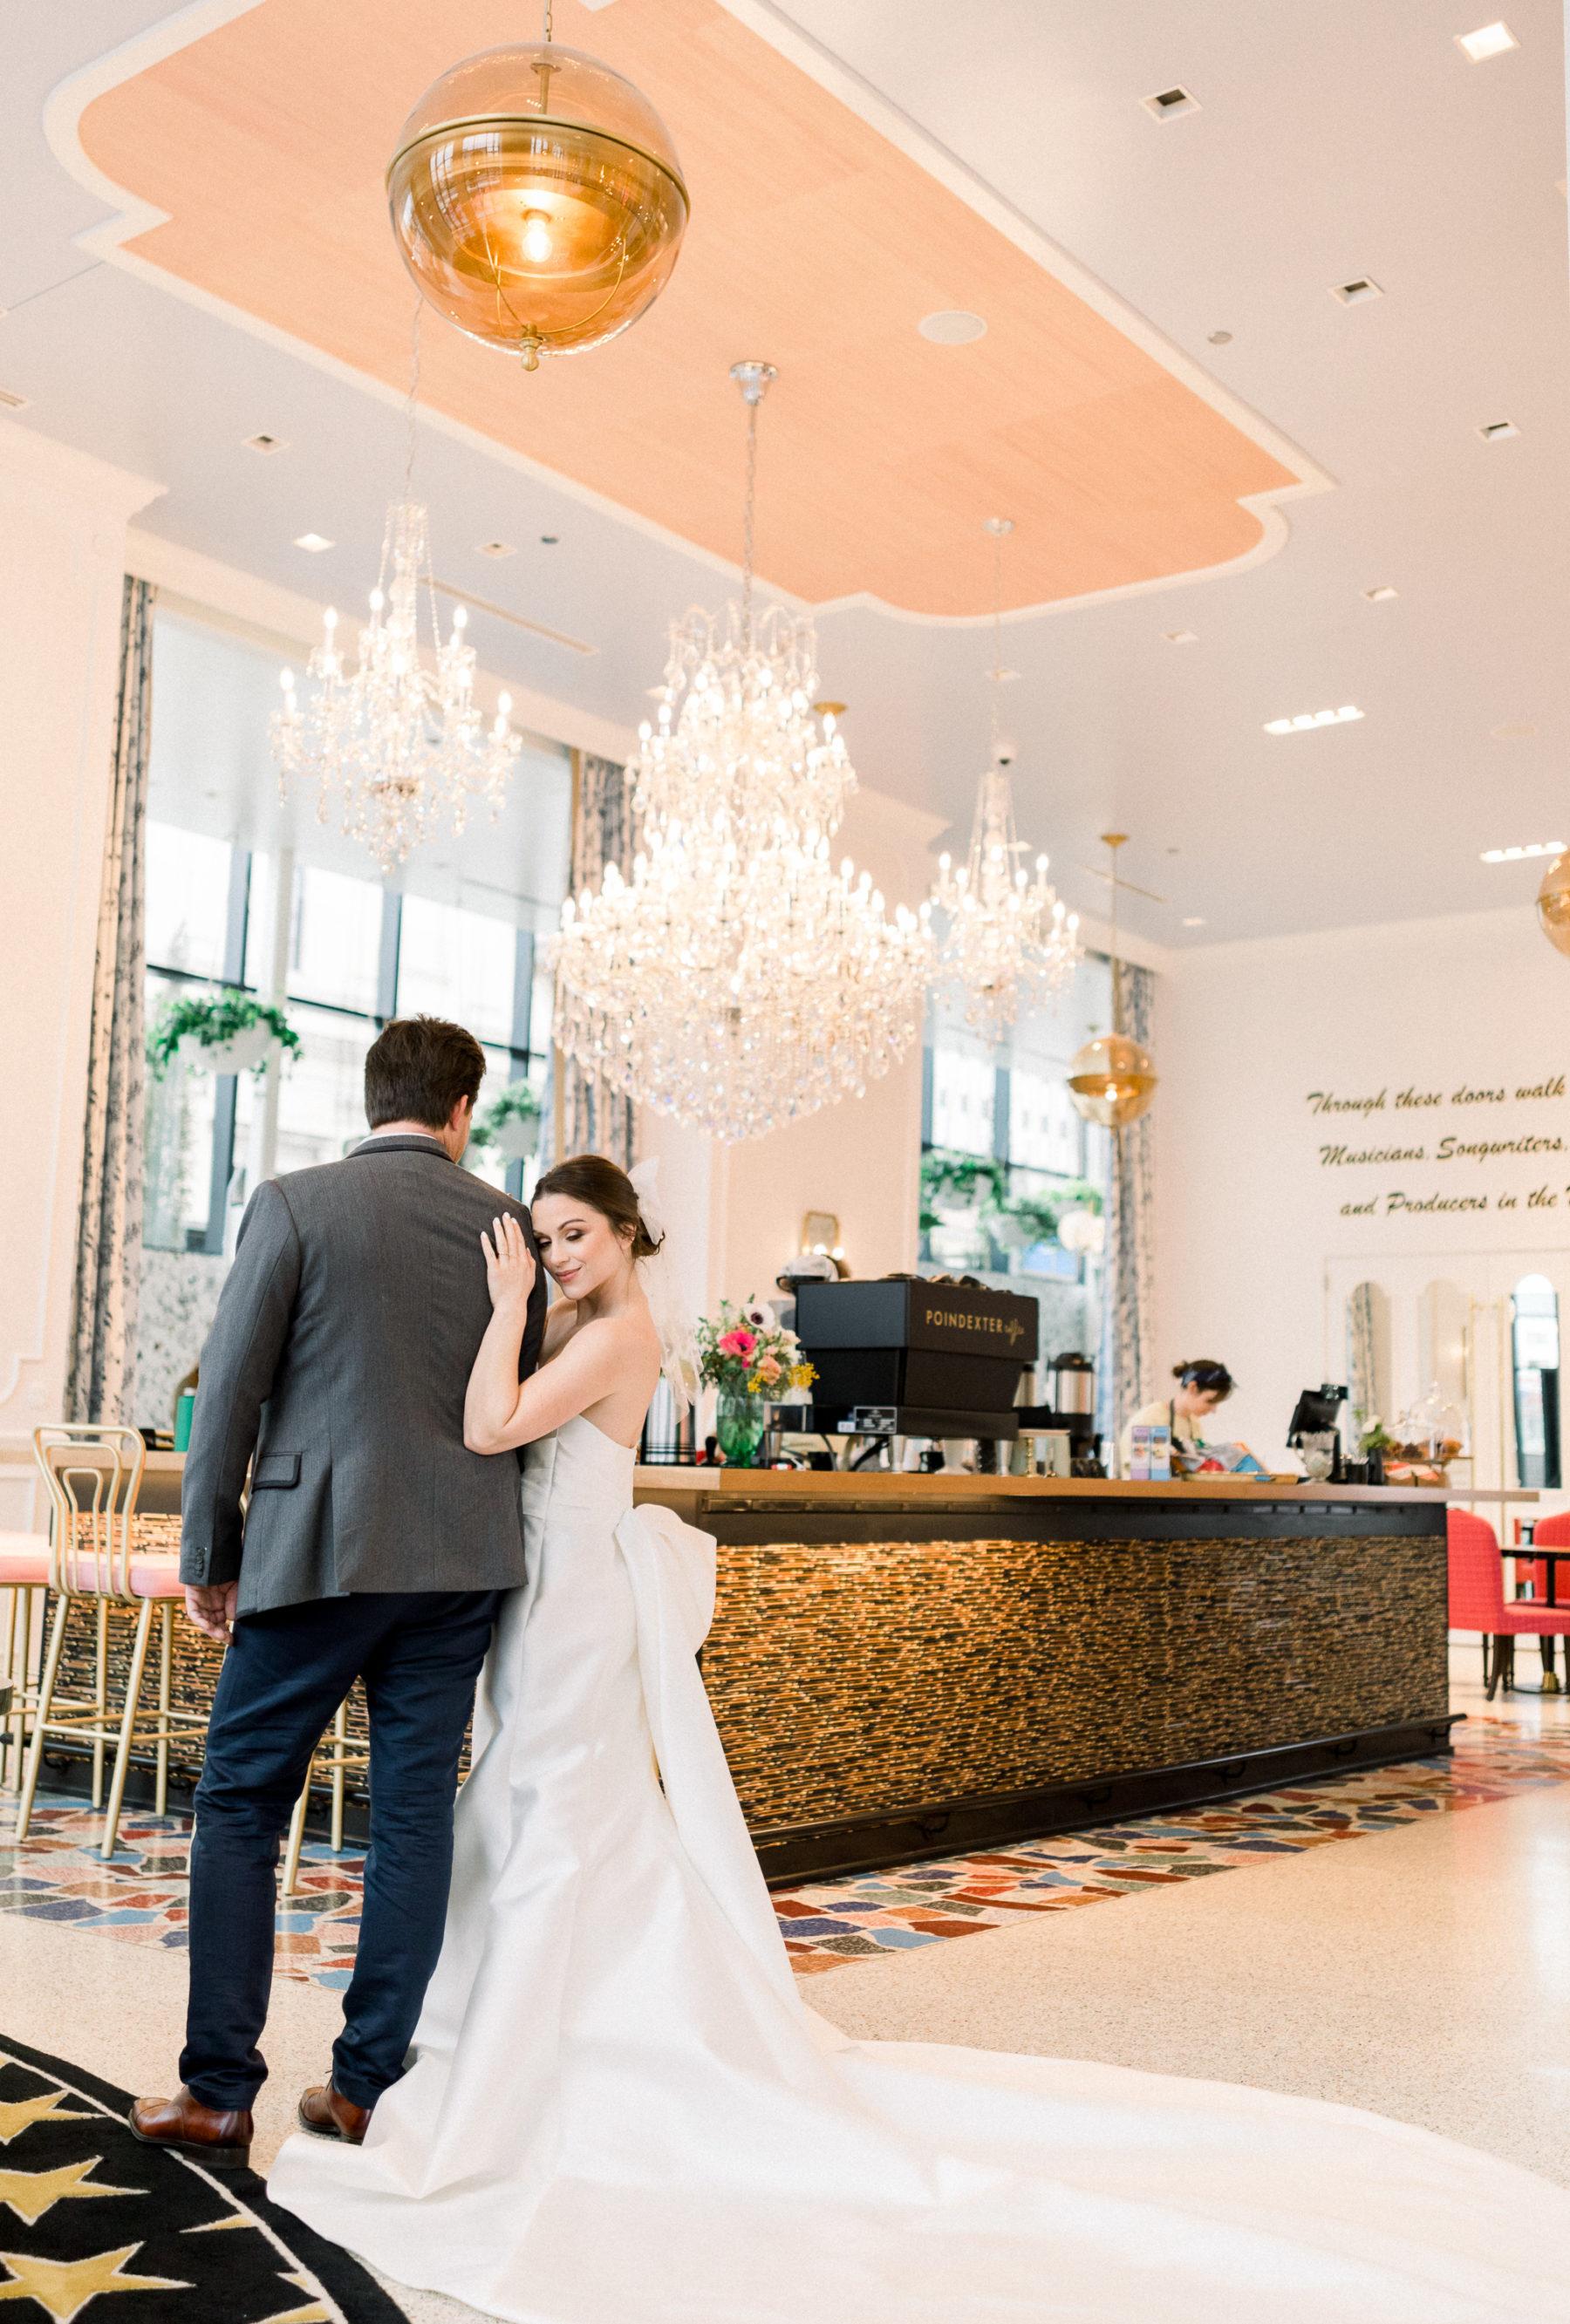 Nashville City Wedding Inspiration featured on Nashville Bride Guide